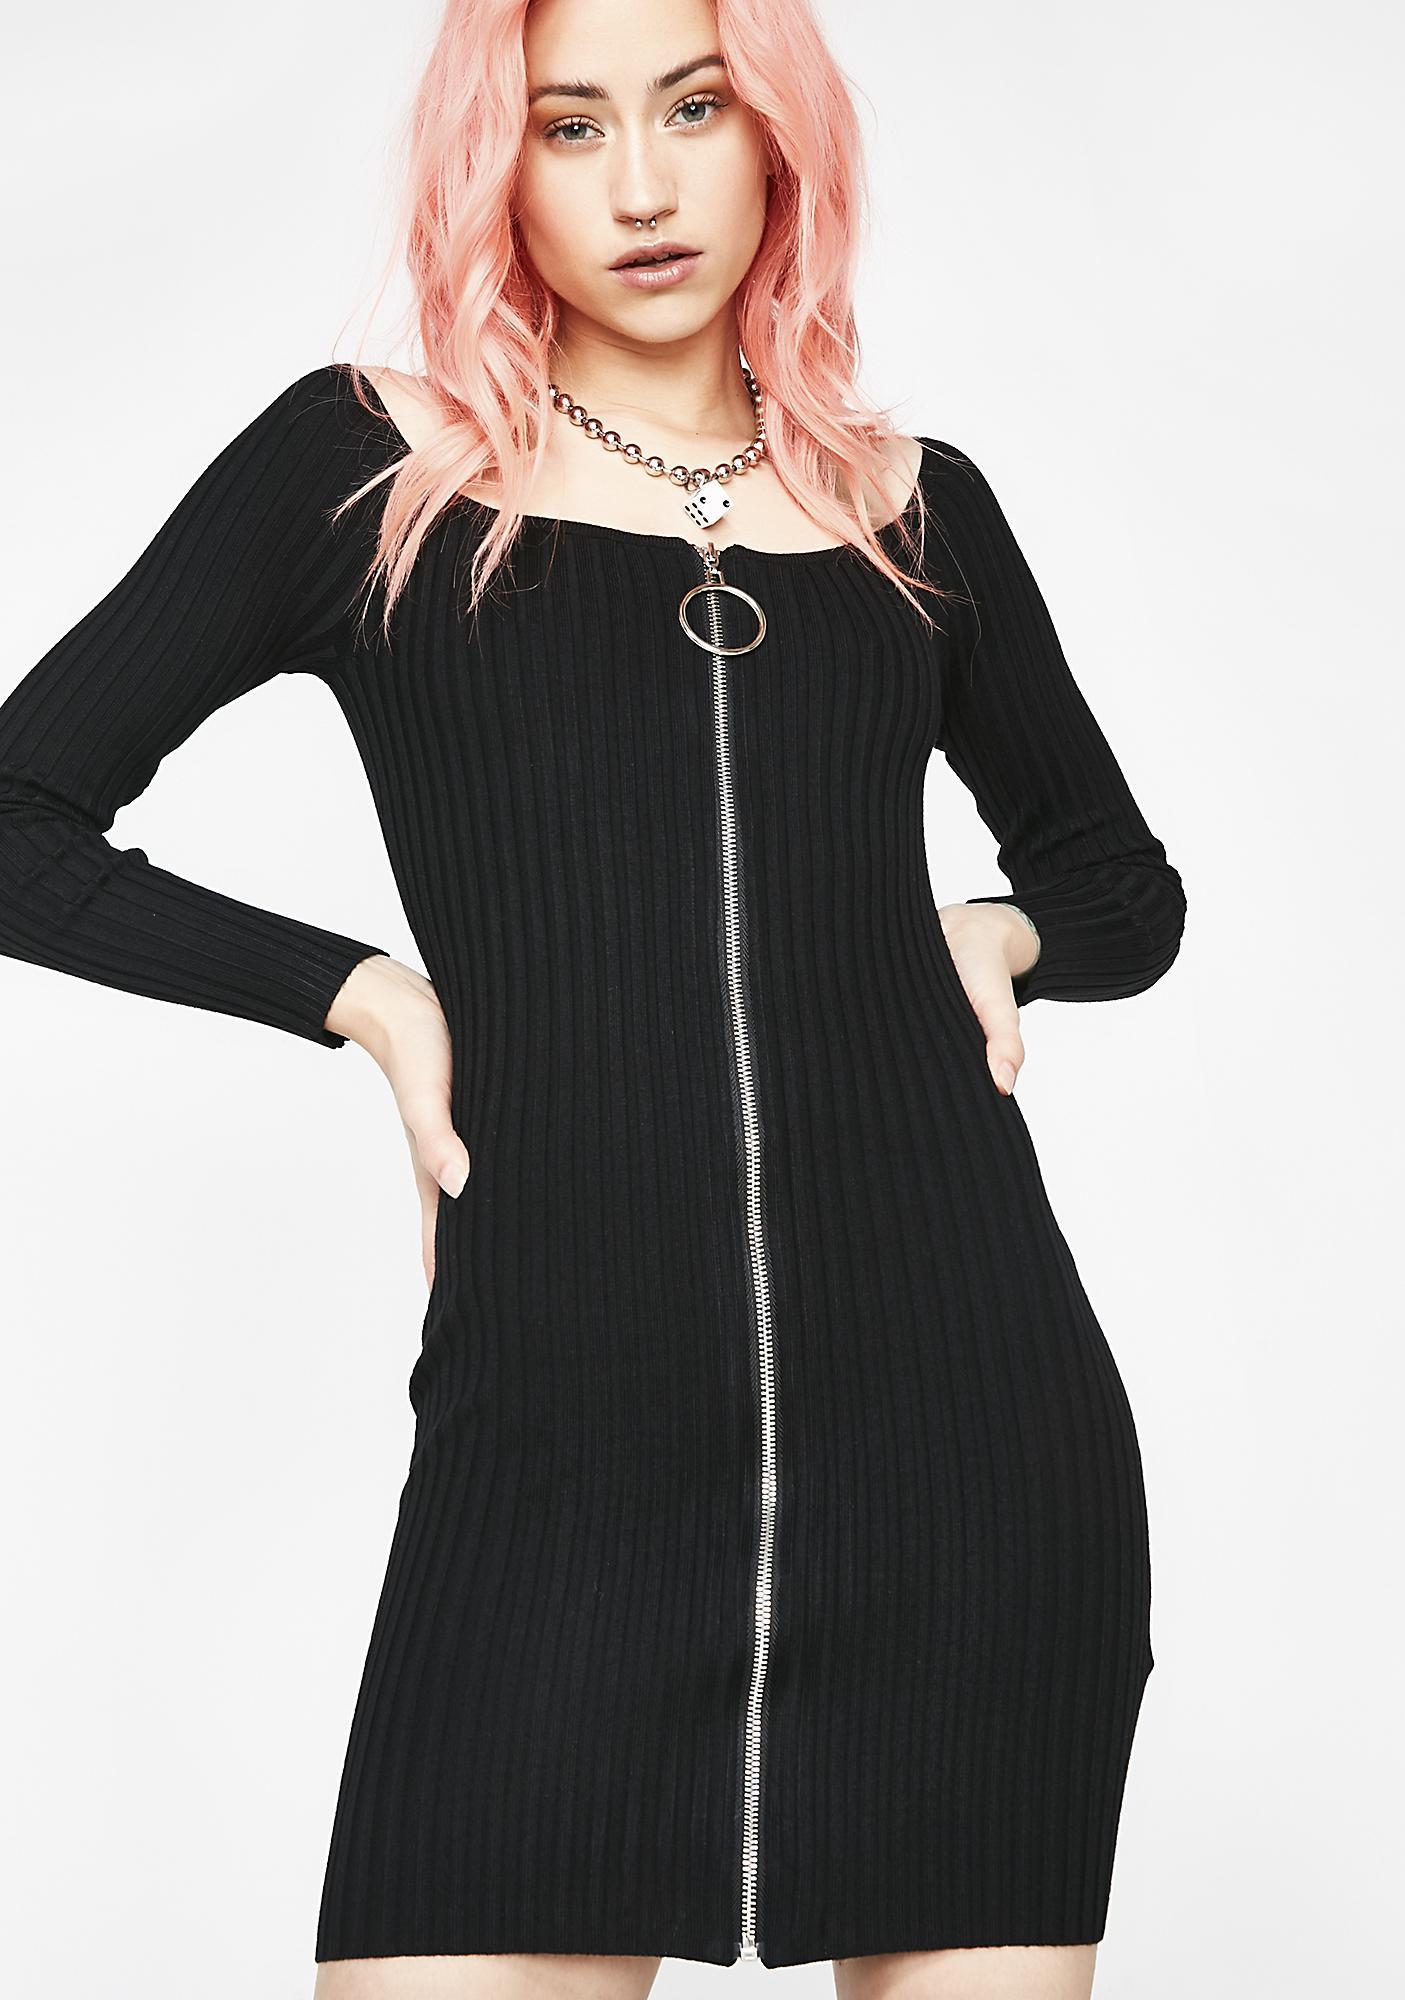 Clap Back O-Ring Dress